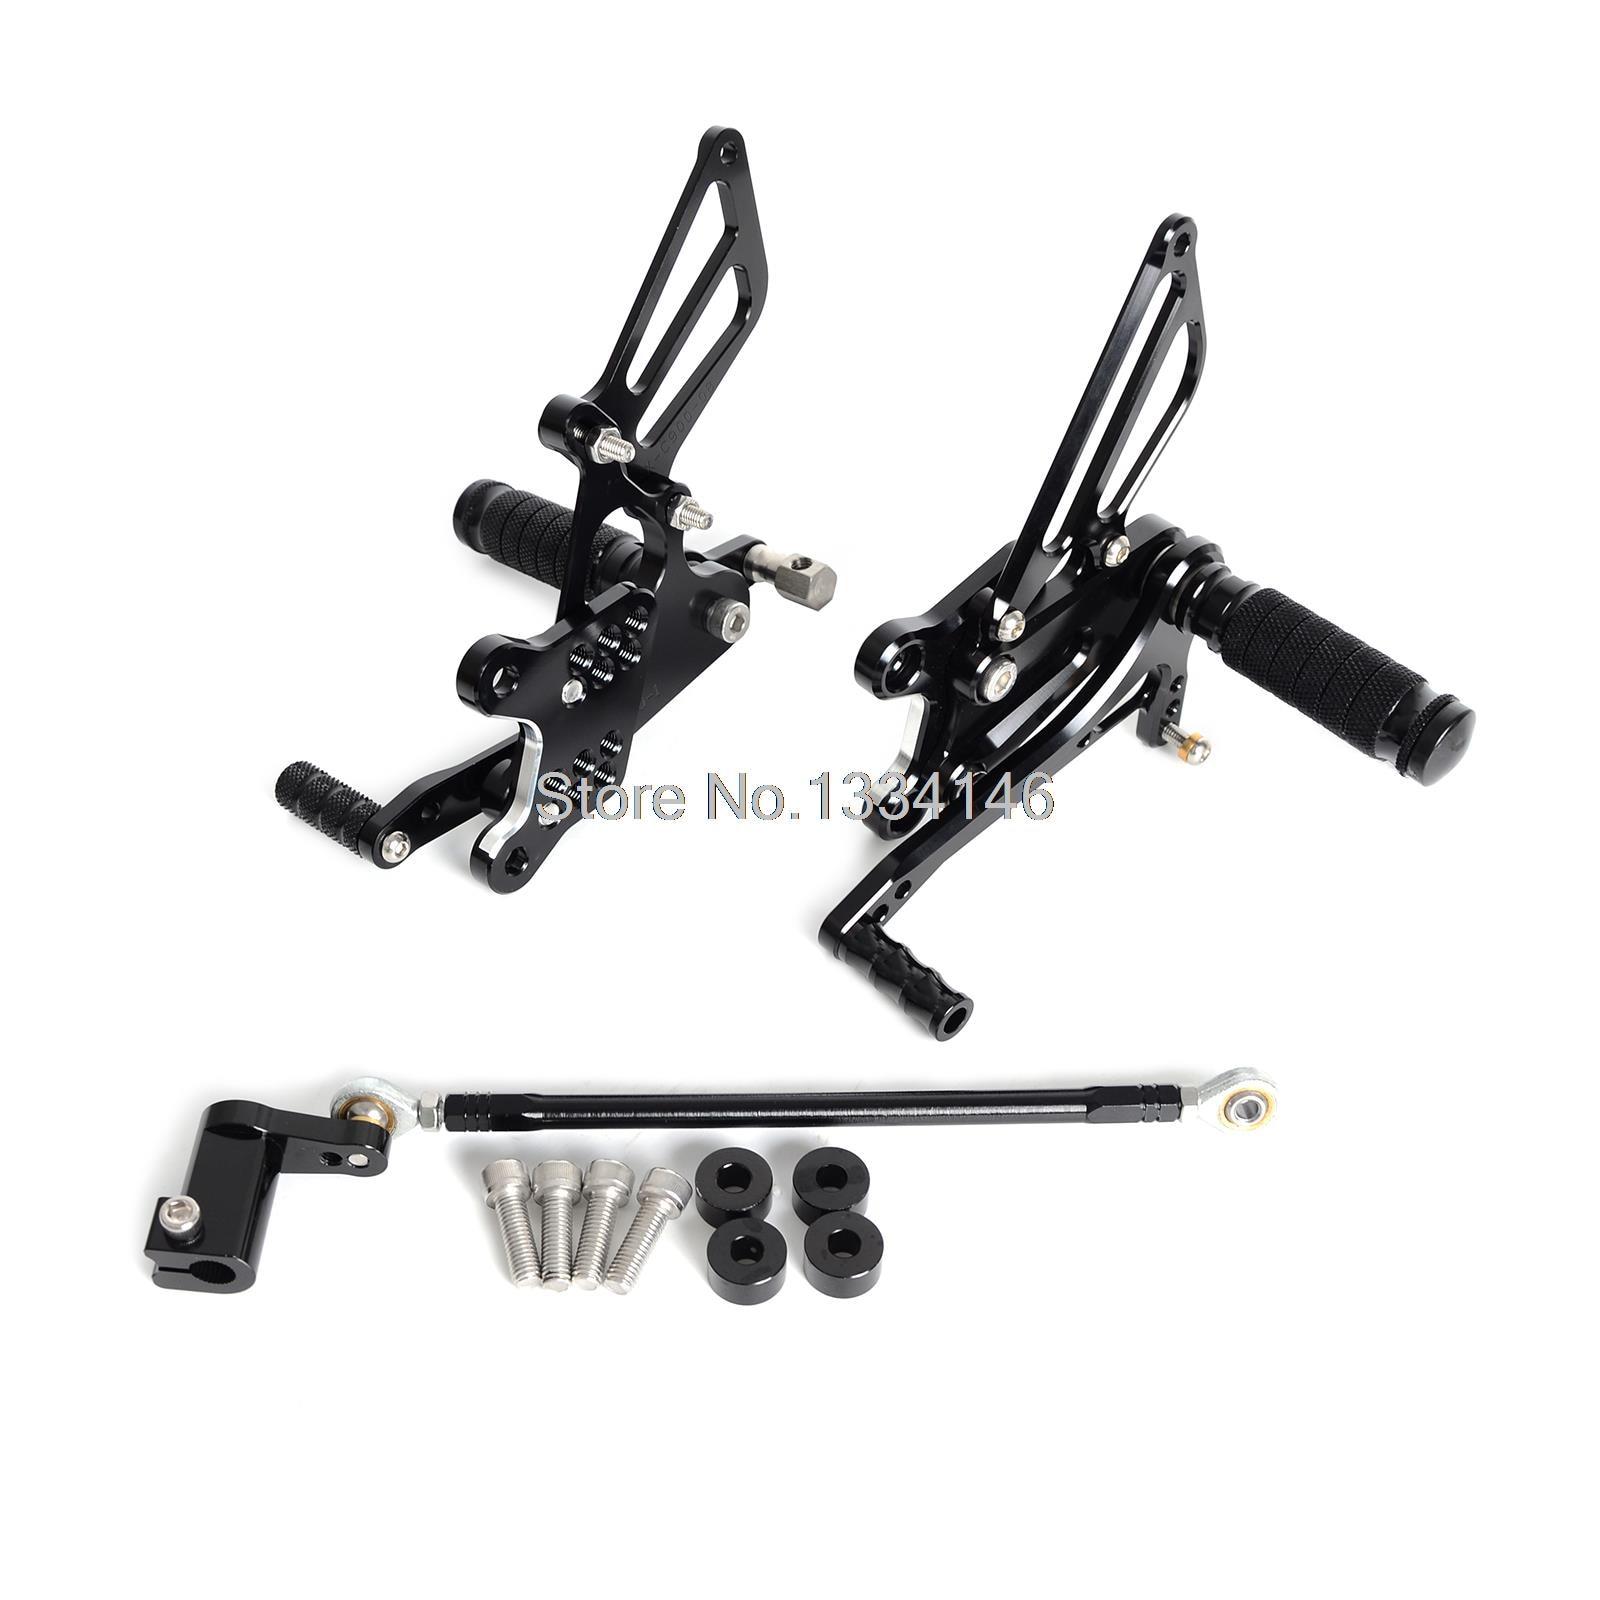 CNC Adjustable Rearset Foot Peg Rear Sets For Honda CBR929 CBR929RR 2001 2002 Black l r pillion foot peg for honda c70 ct90 cb125 cb200 cg110 cg125 jx110 jx125 xl250 xl350